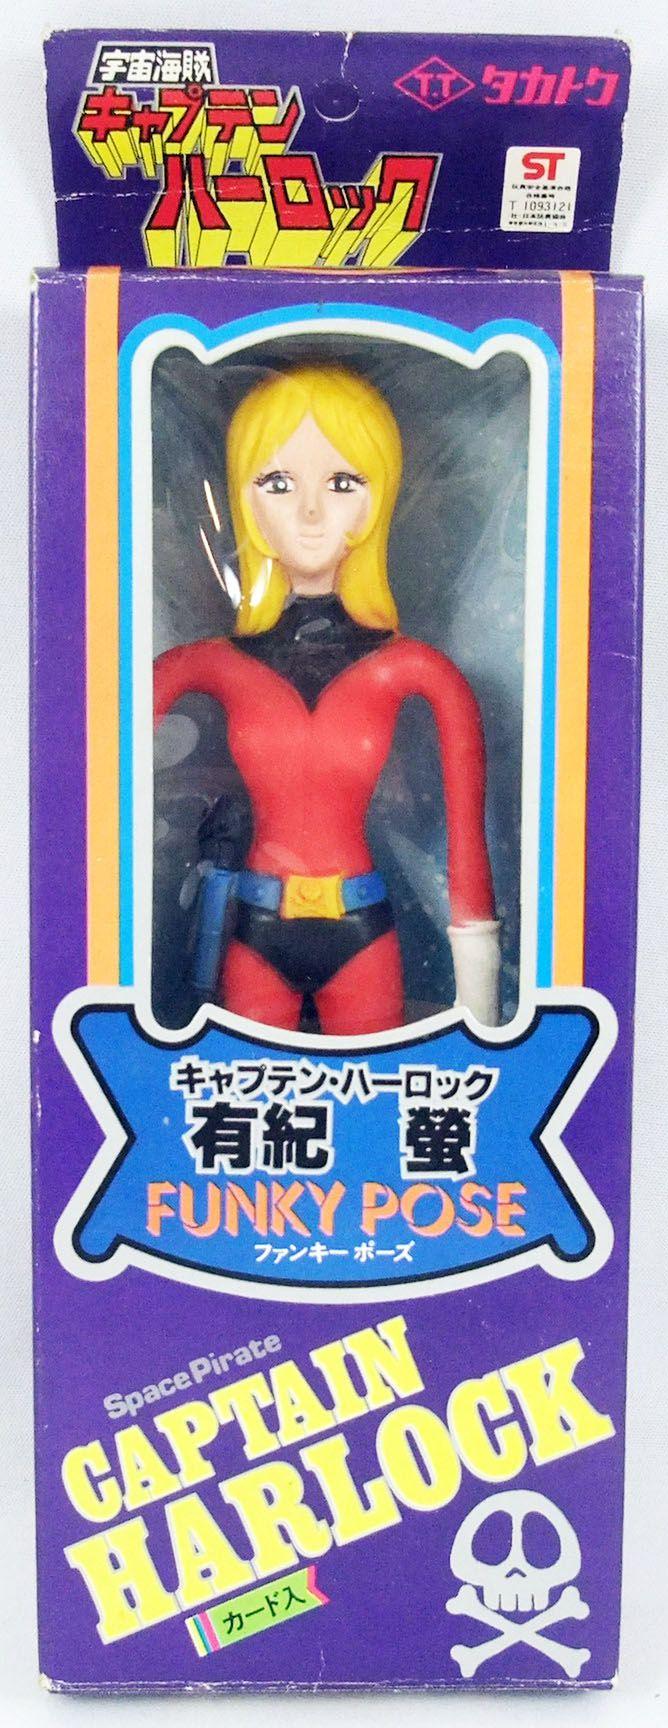 Albator - Nausica - Figurine flexible - Takatoku